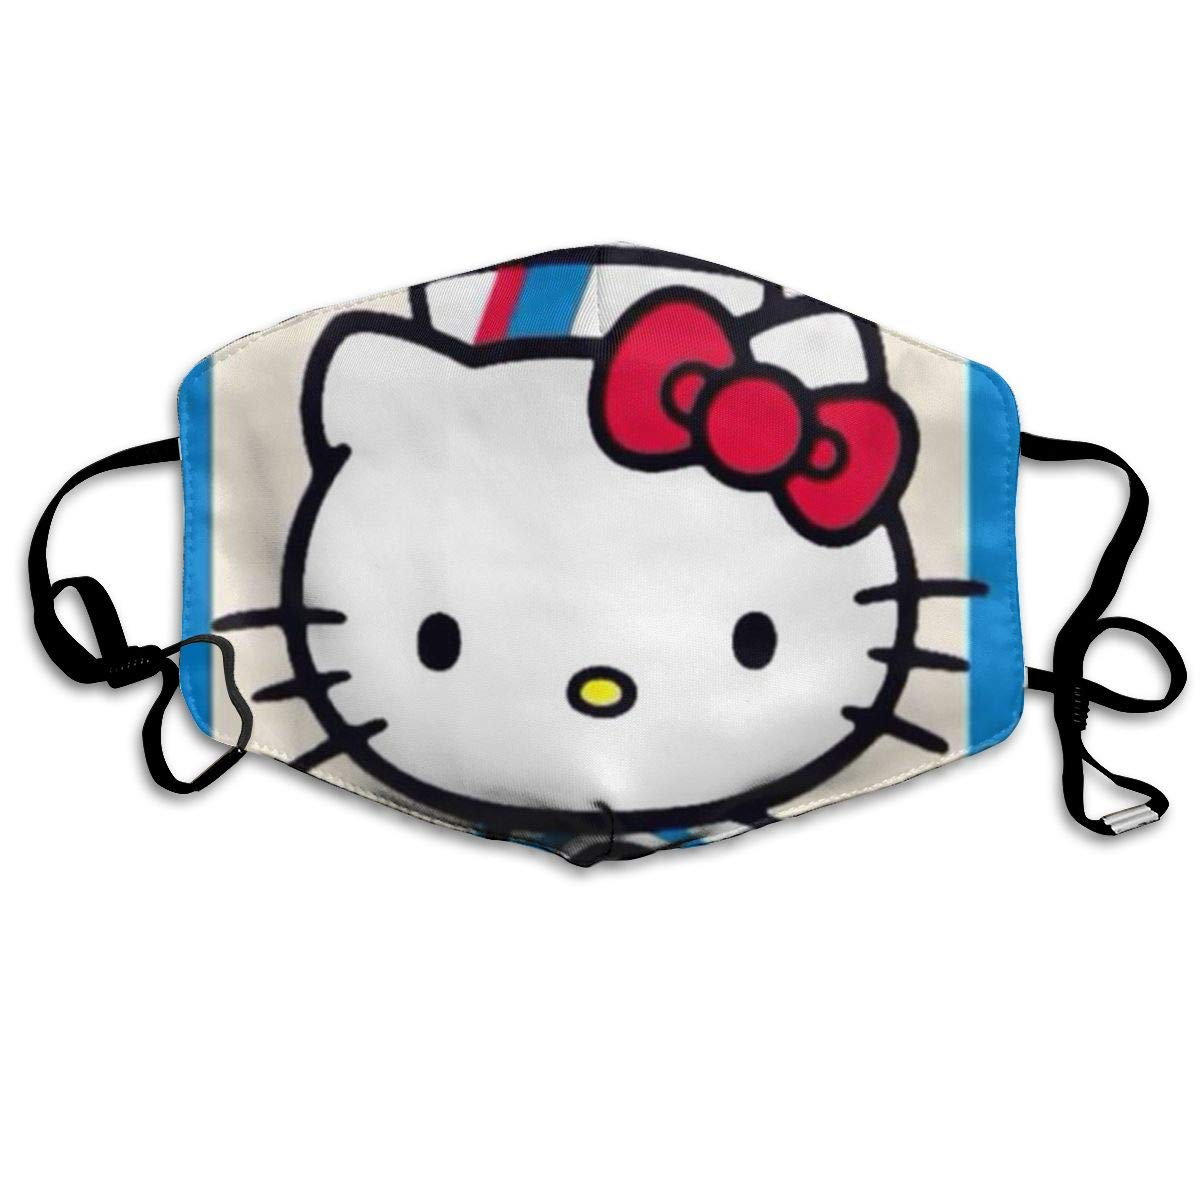 fb91d18f5 Amazon.com: Dust Mask- Stylish Hello Kitty Sailor Reusable Face Mask Flu  Mask for Men Women: Home & Kitchen